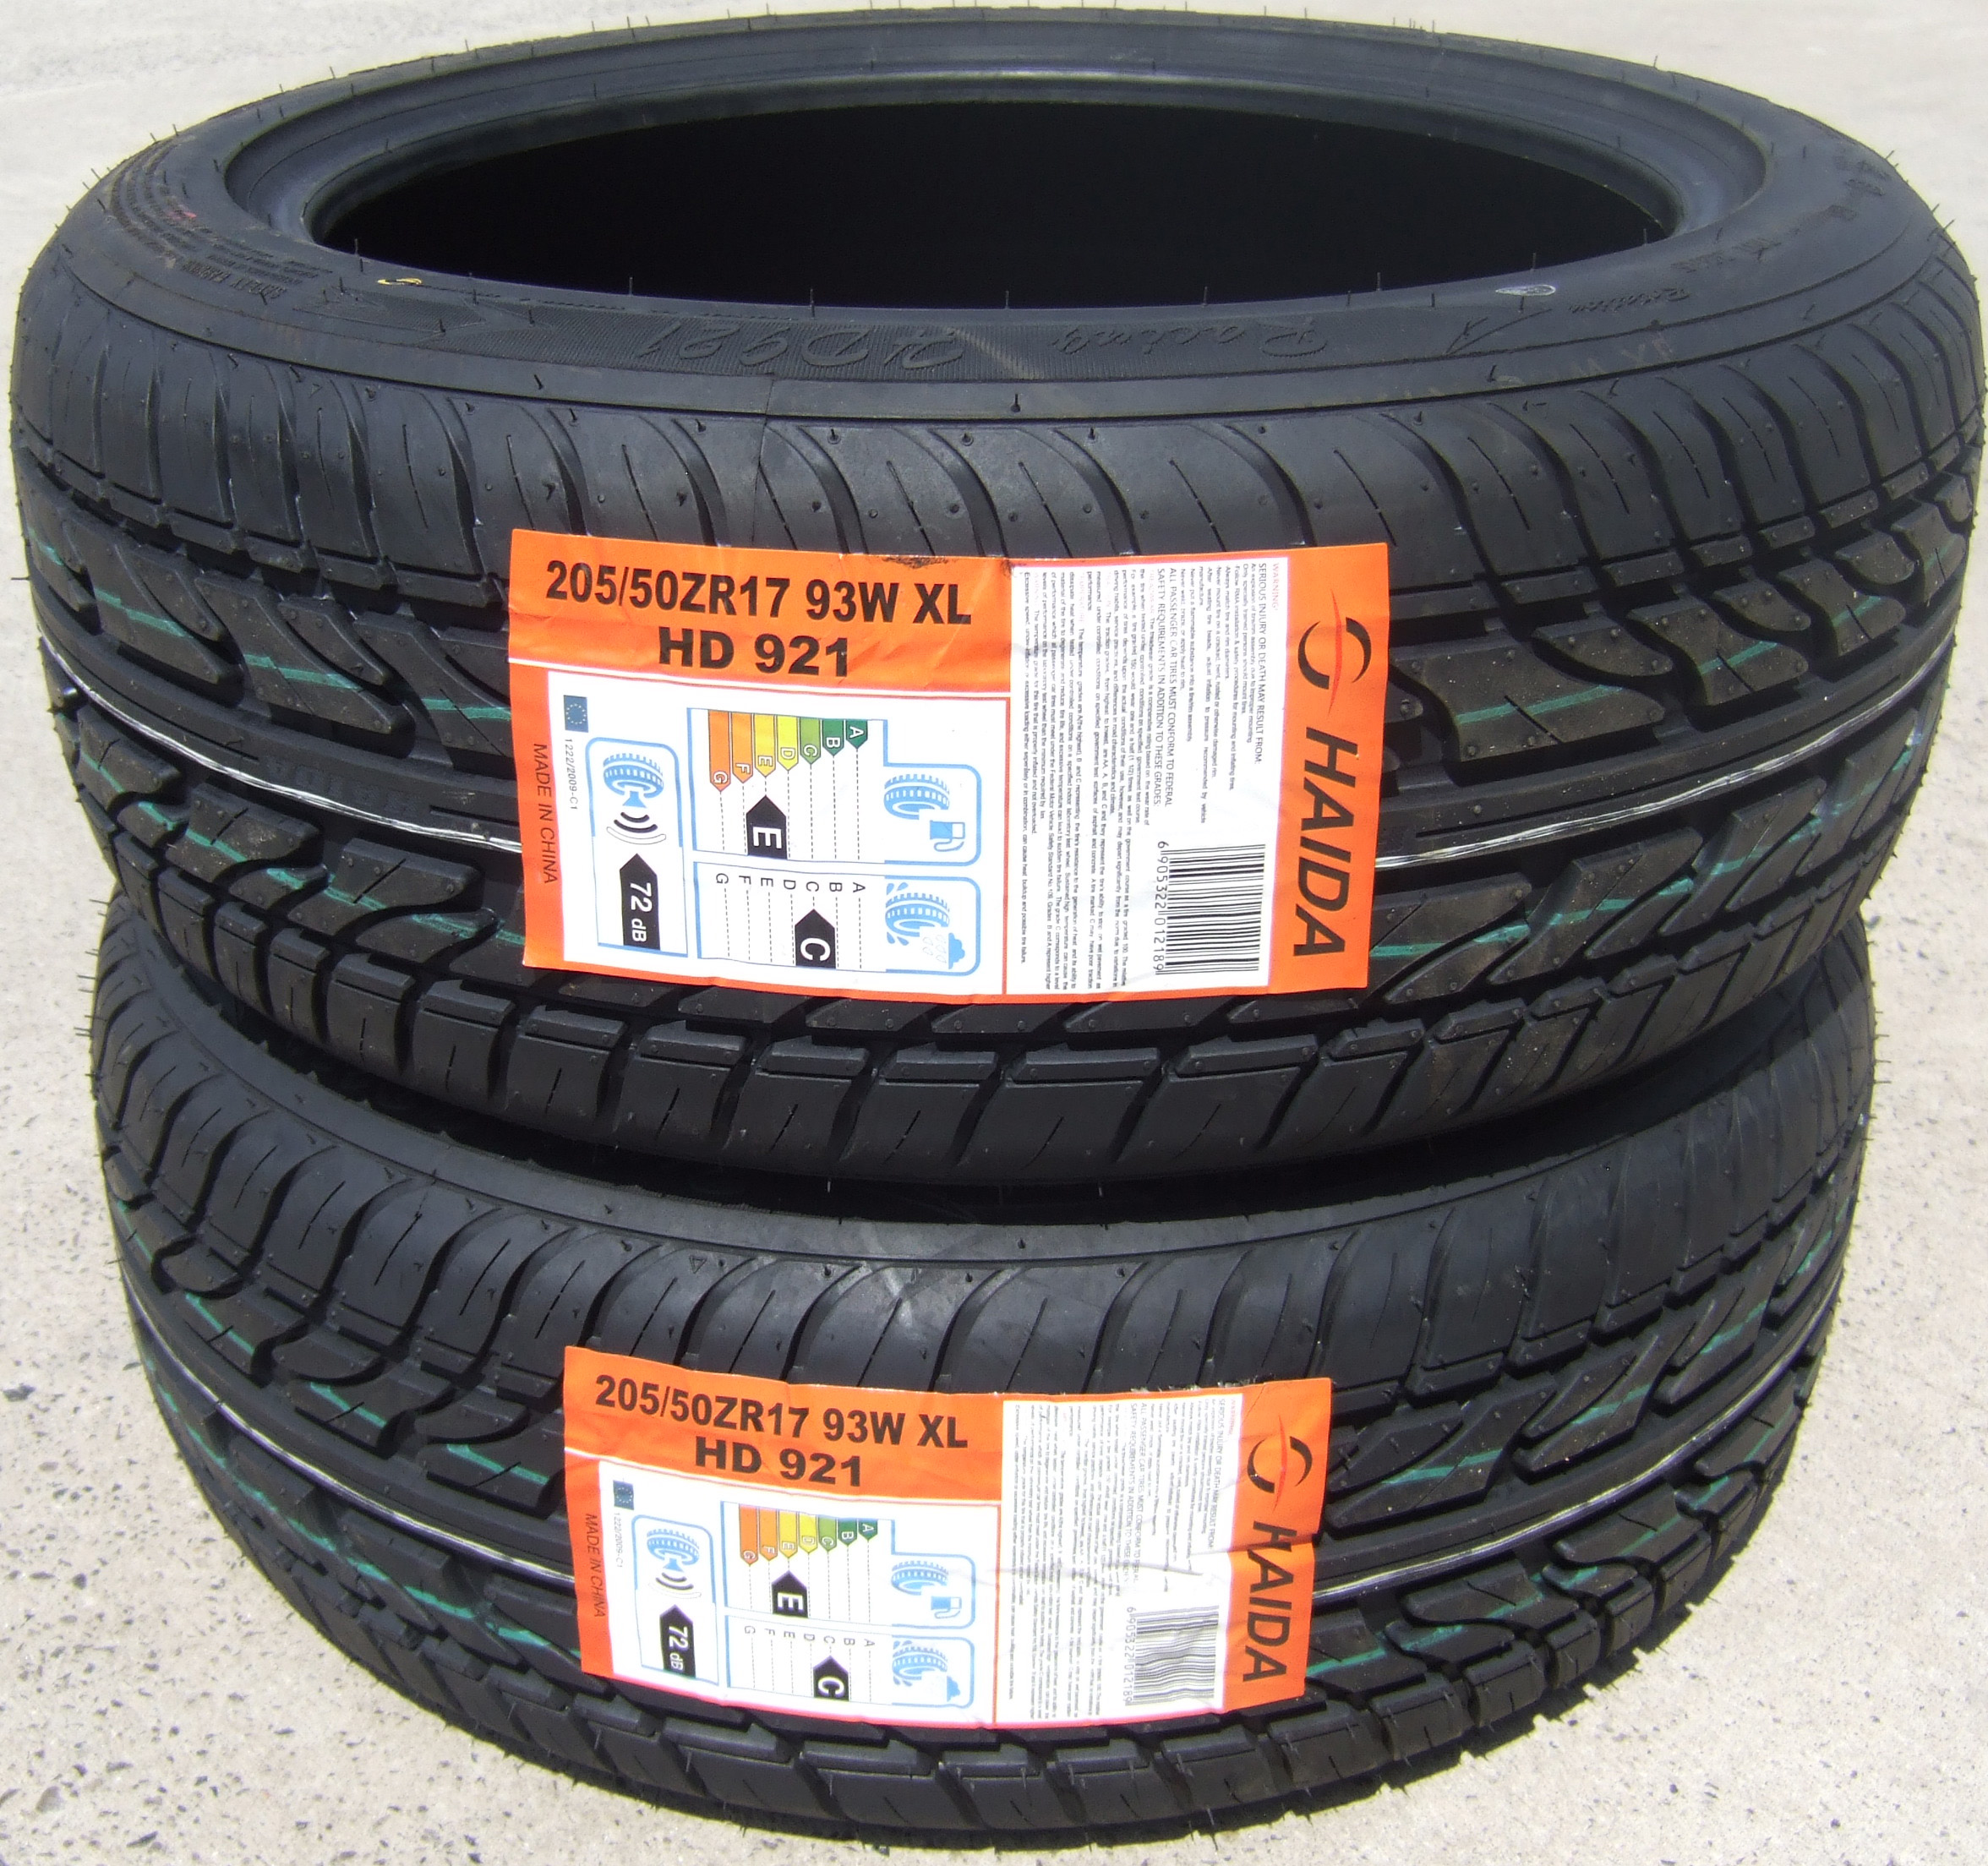 205 50 17 haida hd921 premium budget tyres 2055017 93w xl 205 50 17 x2 ebay. Black Bedroom Furniture Sets. Home Design Ideas